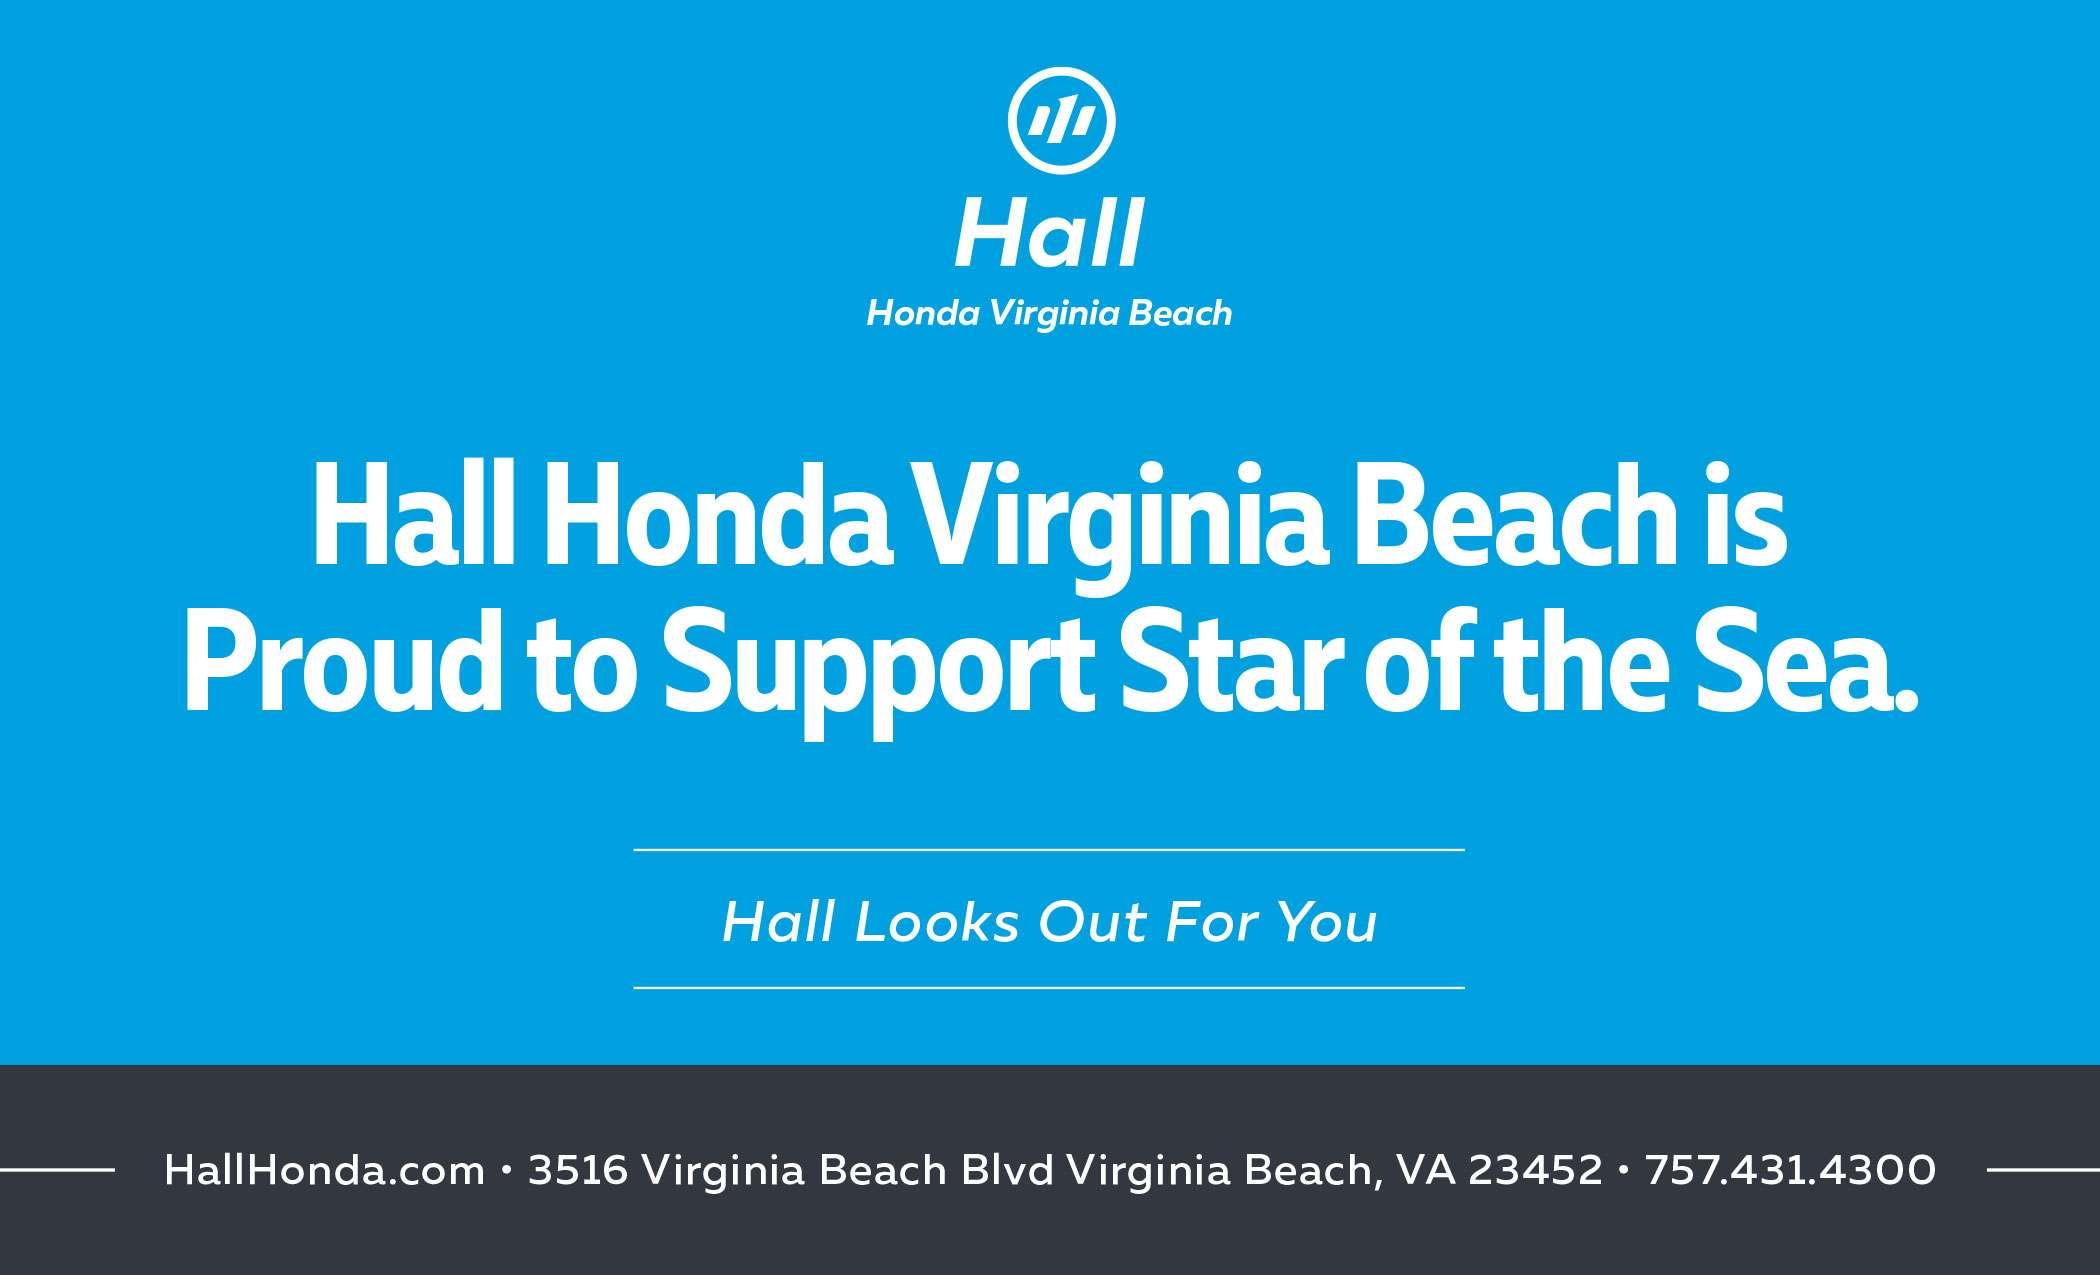 Hall Honda